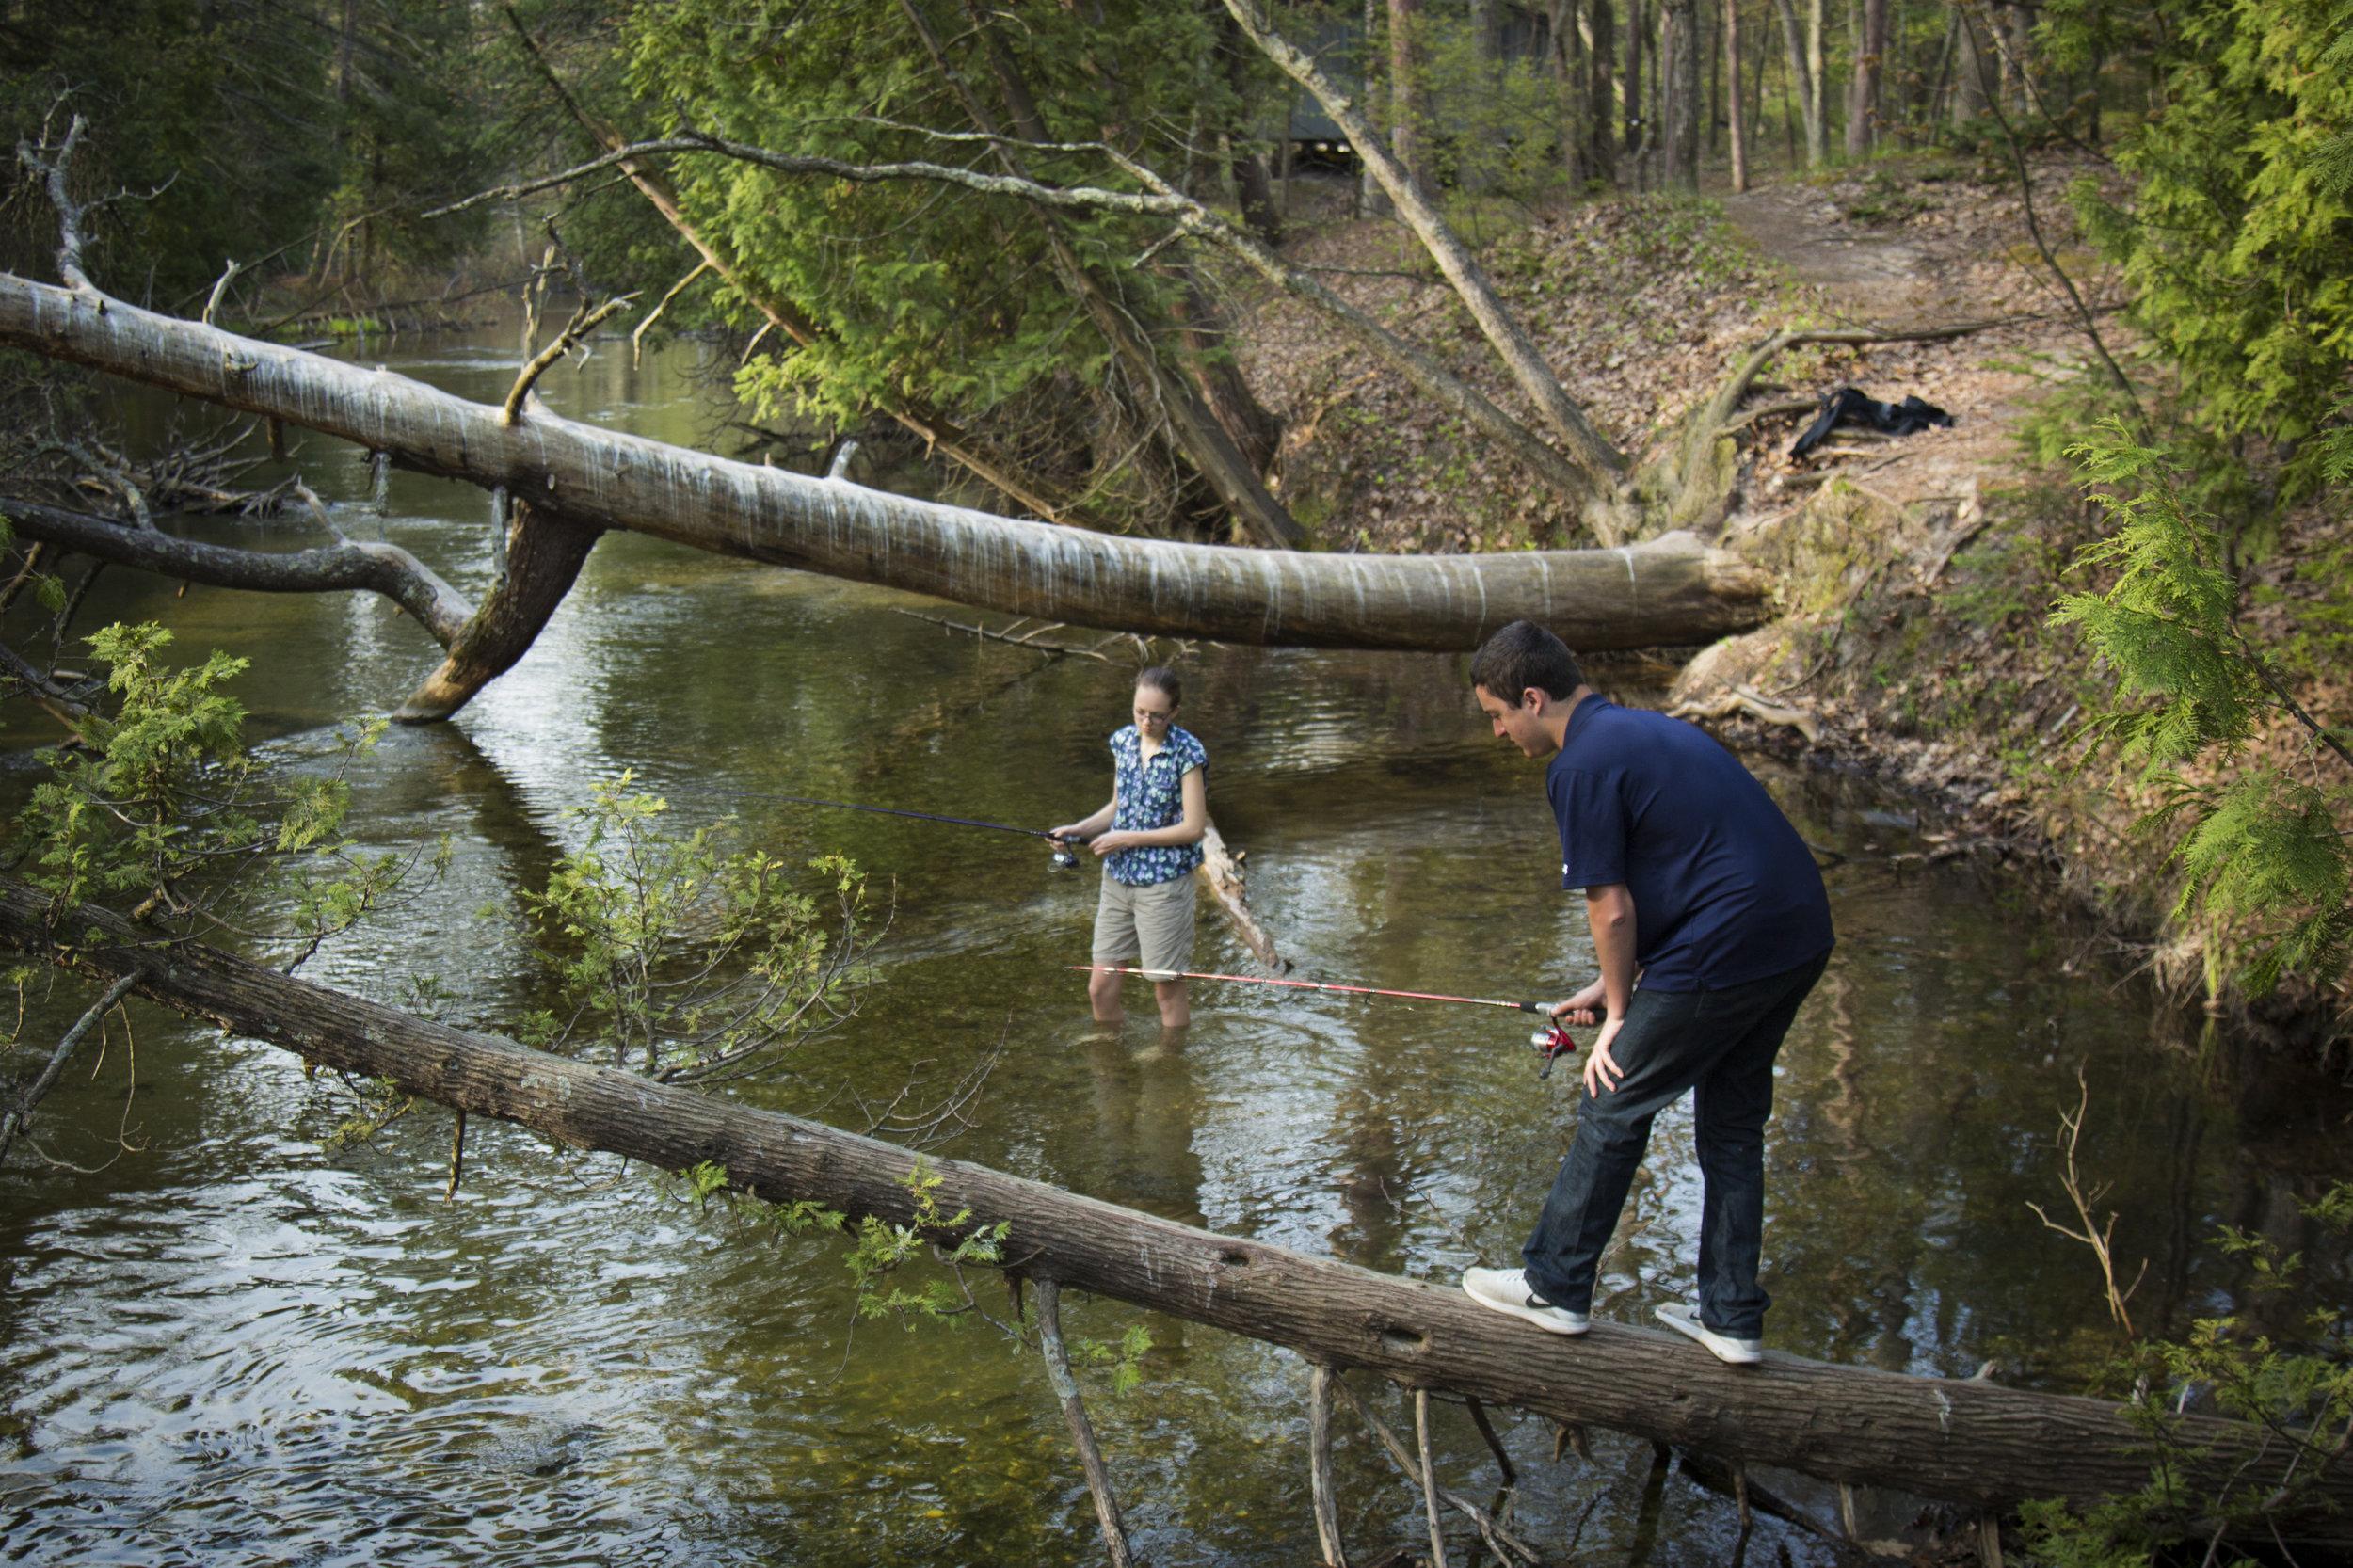 students_fishing_river.jpg